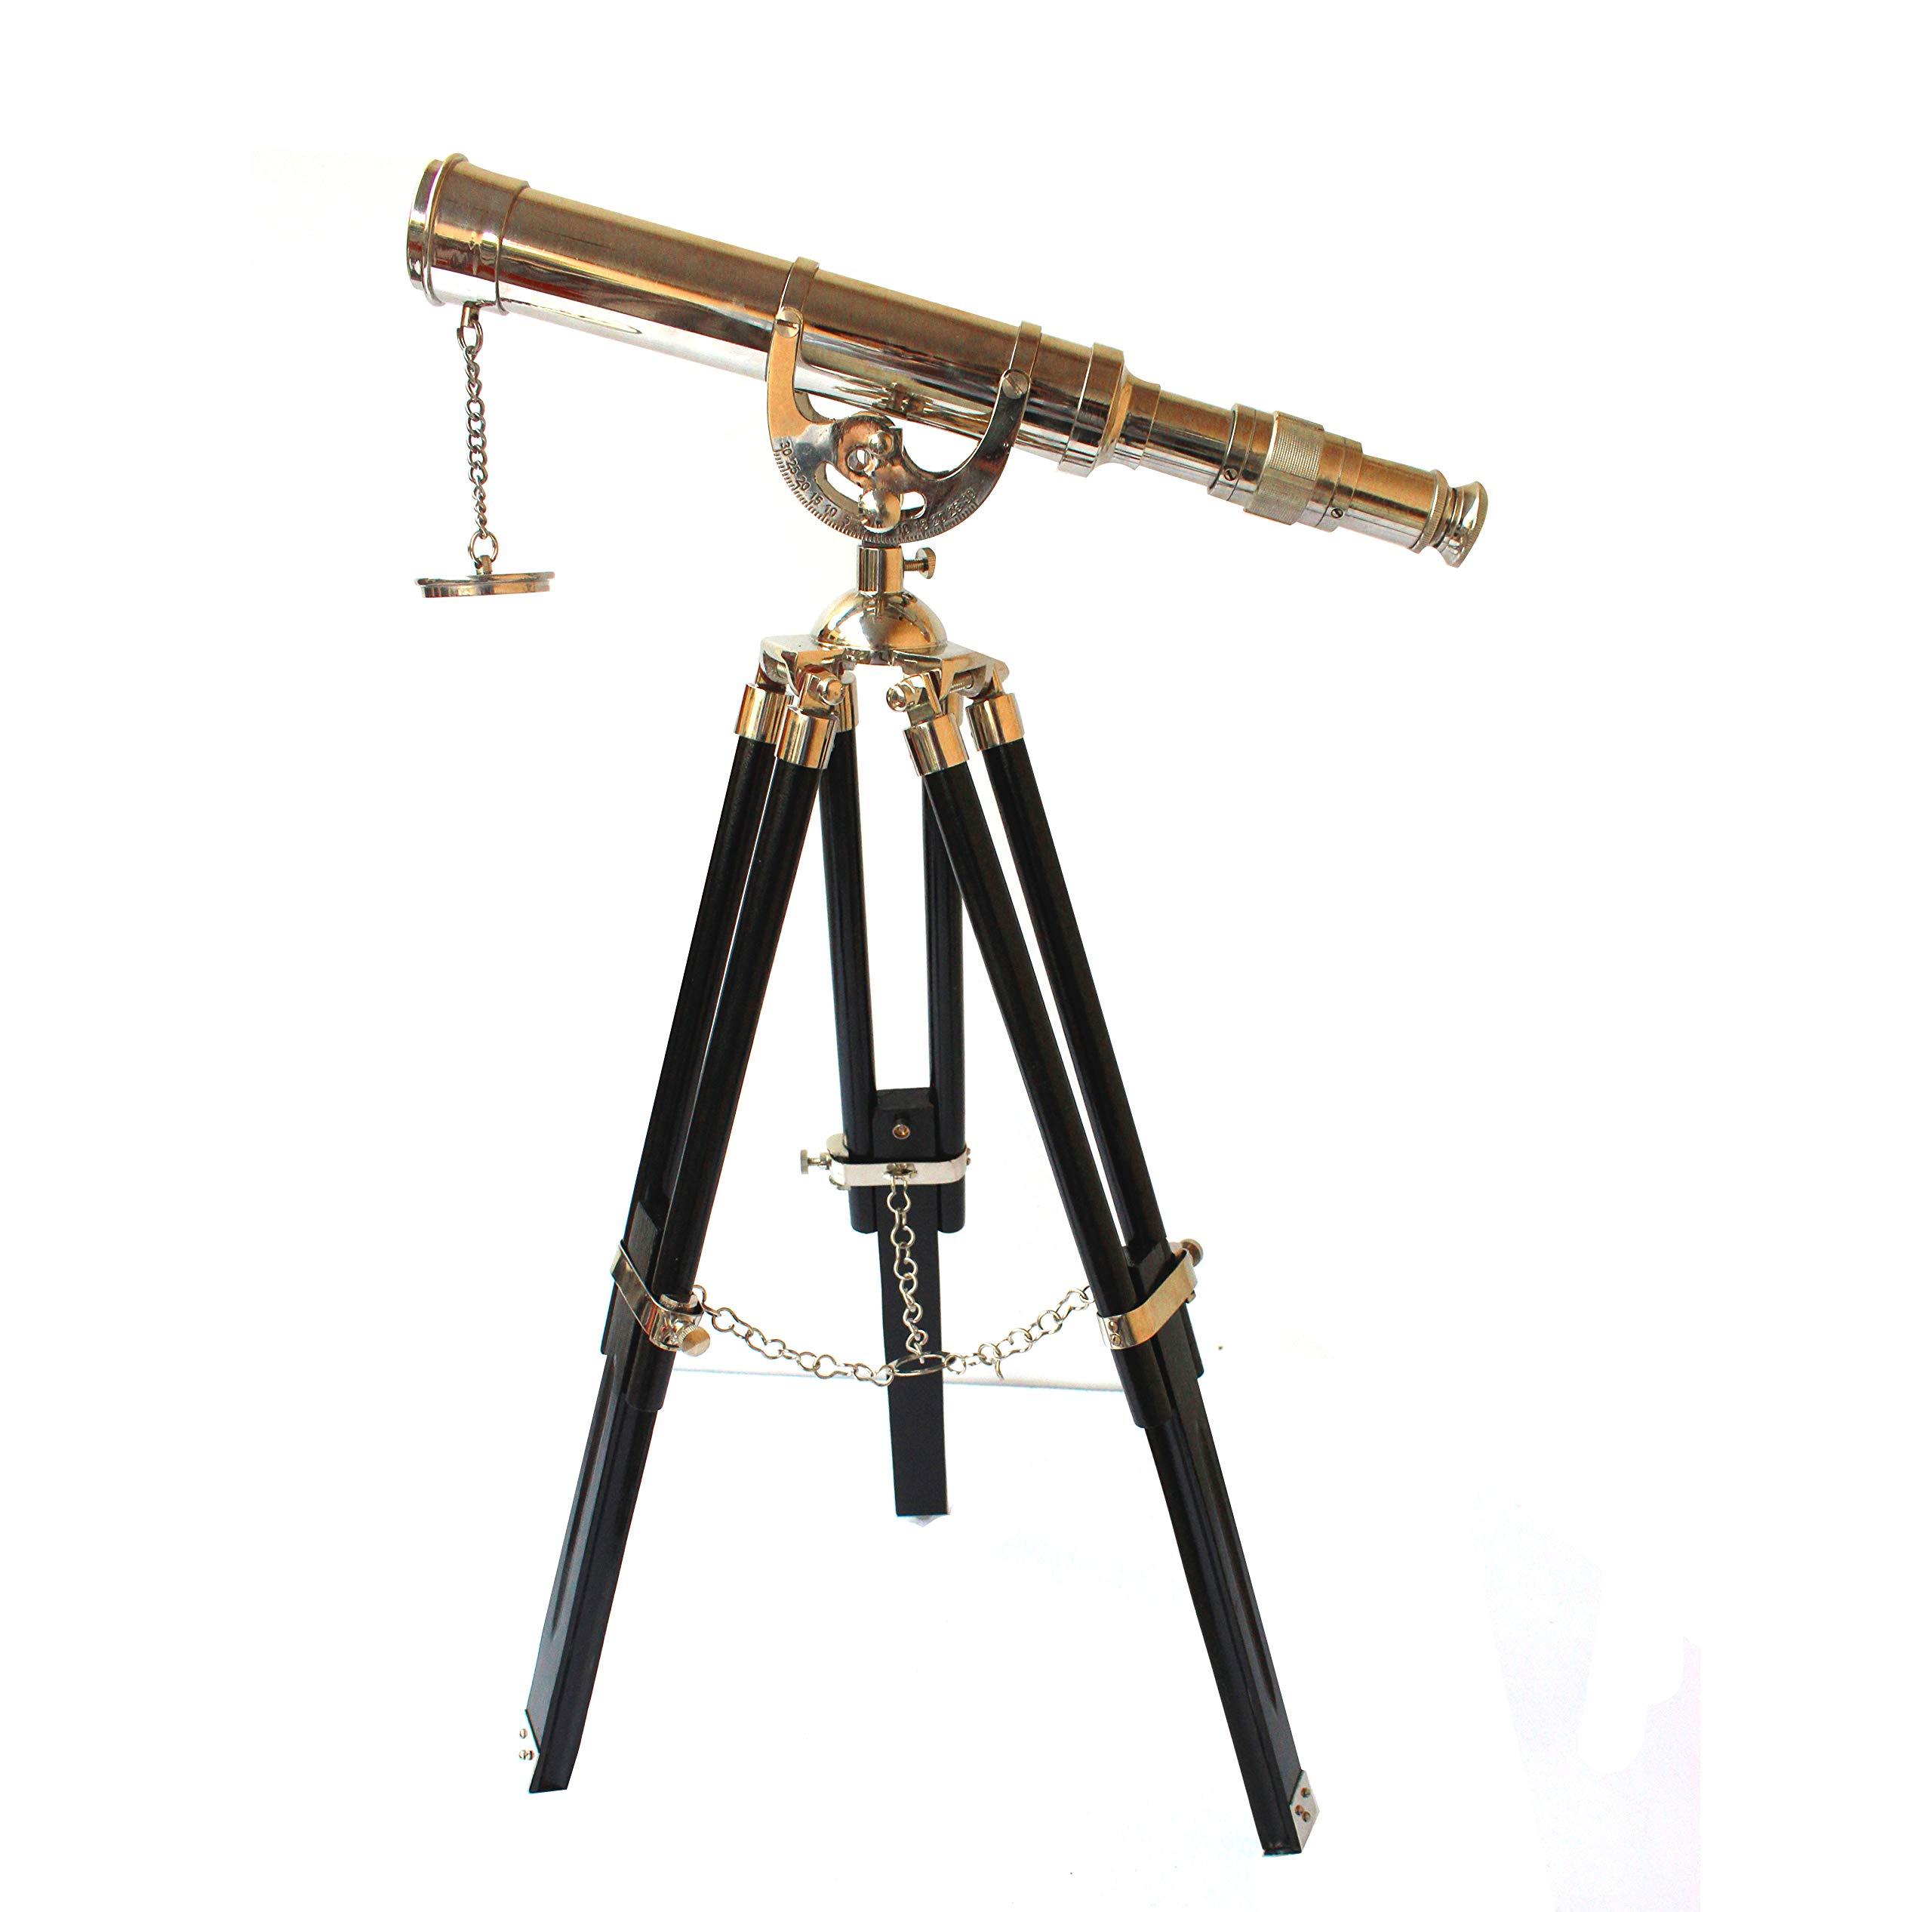 Vintage Antique Tripod Telescope Brass Nautical Telescopes Harbour Master Stand (Nickel Finish)